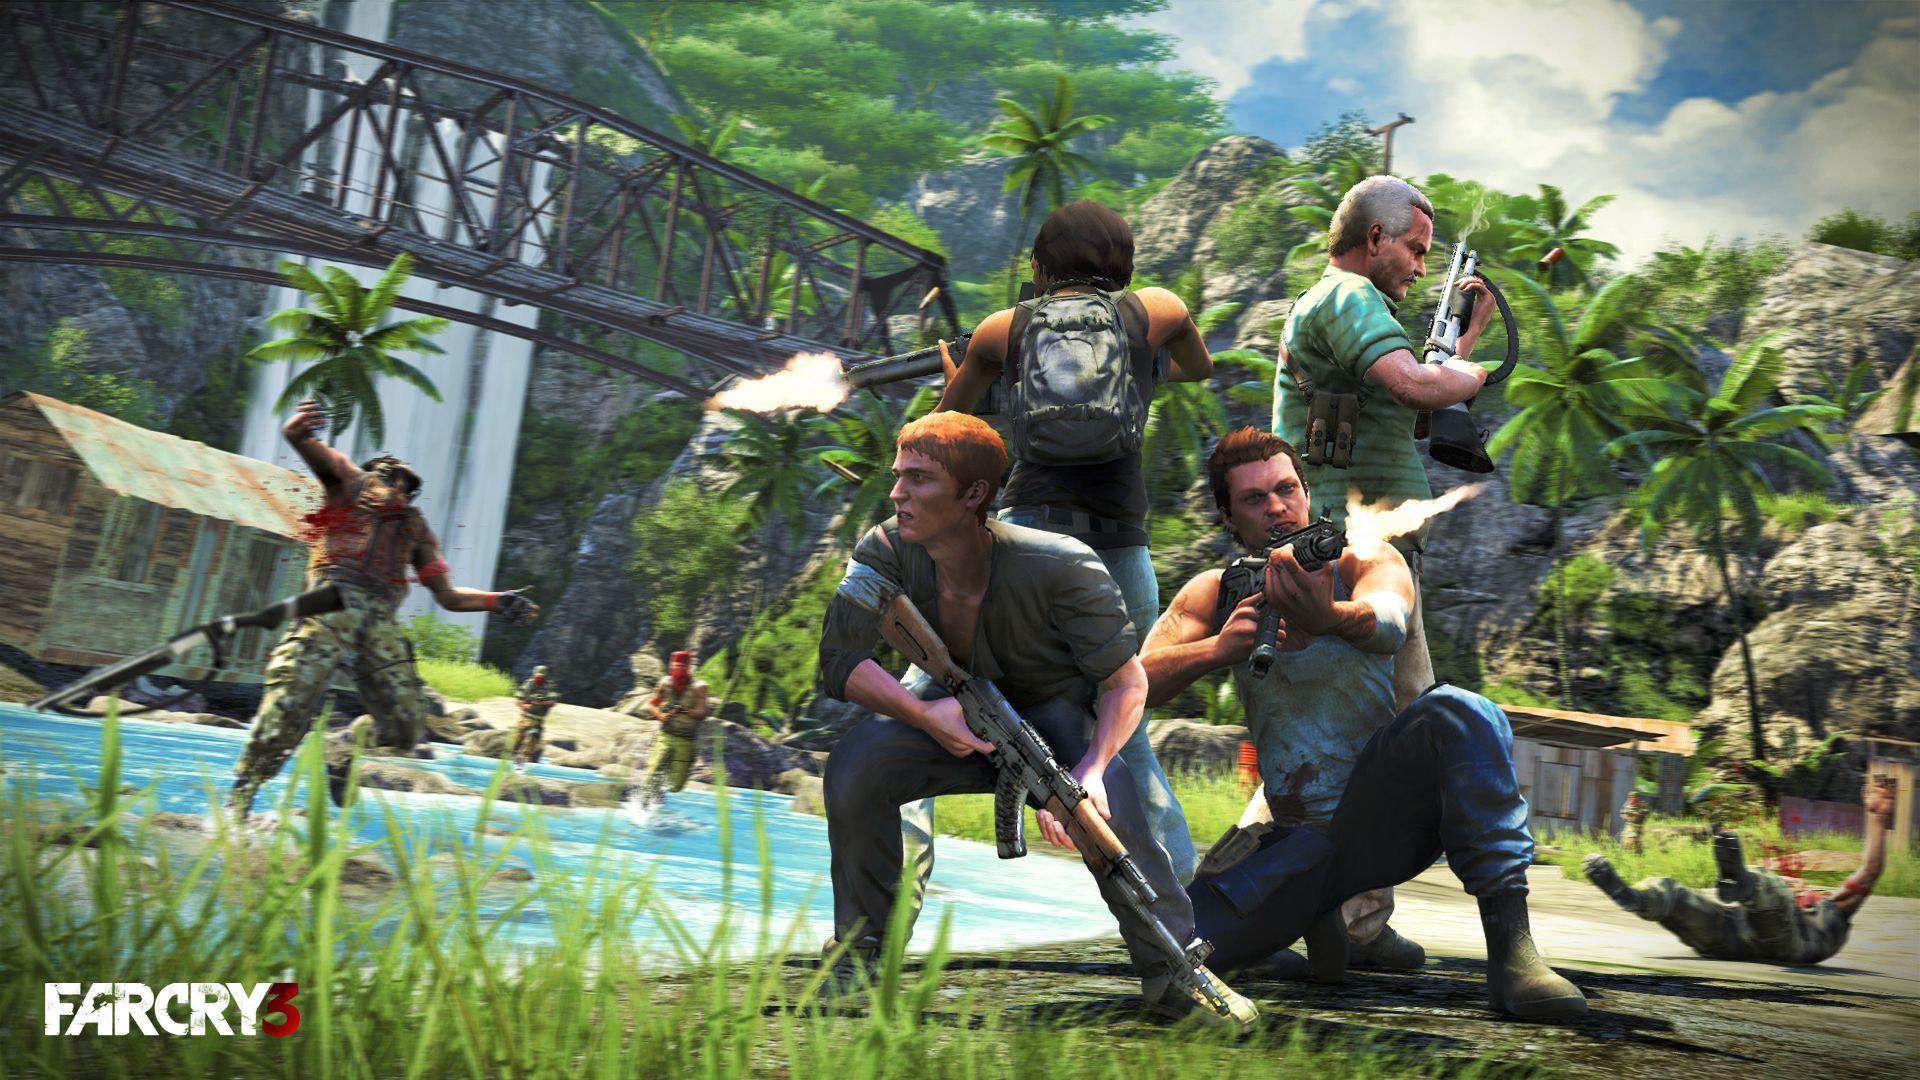 Far Cry 3 sur PlayStation 3 - jeuxvideocom